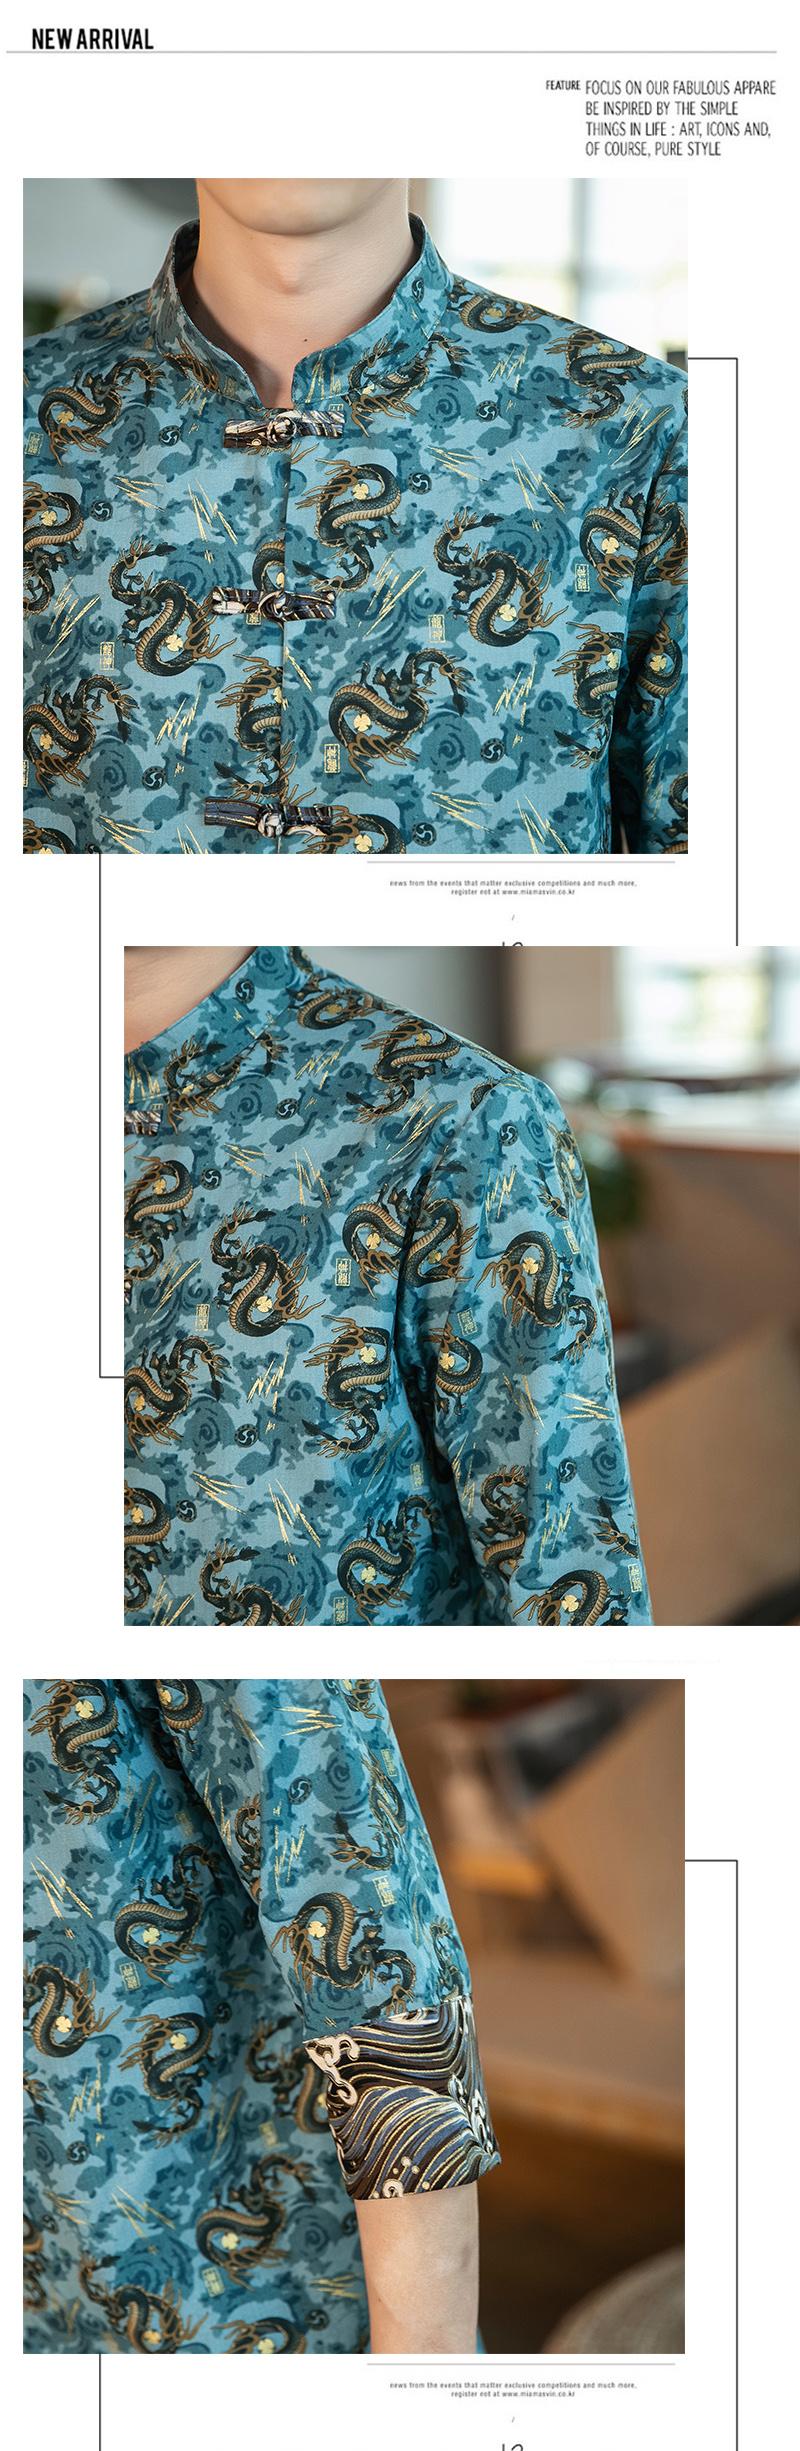 C945新春夏小龙五分袖中国风棉麻中袖衬衣盘扣衬衫男314A-1-P40